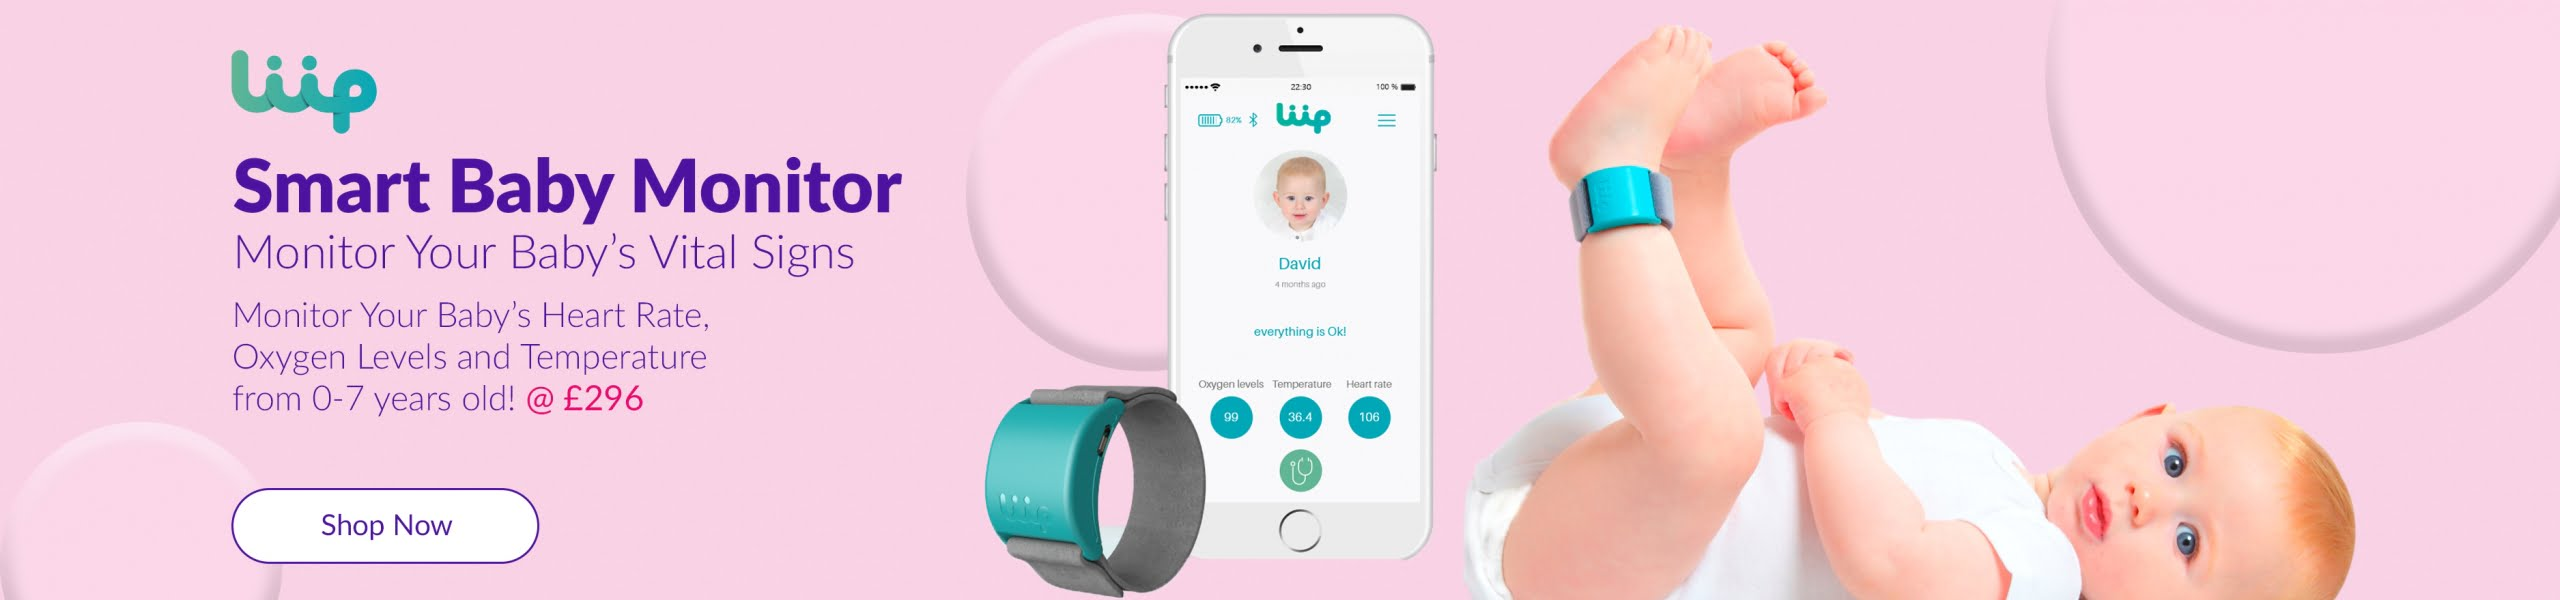 Liip Smart Baby Monitor